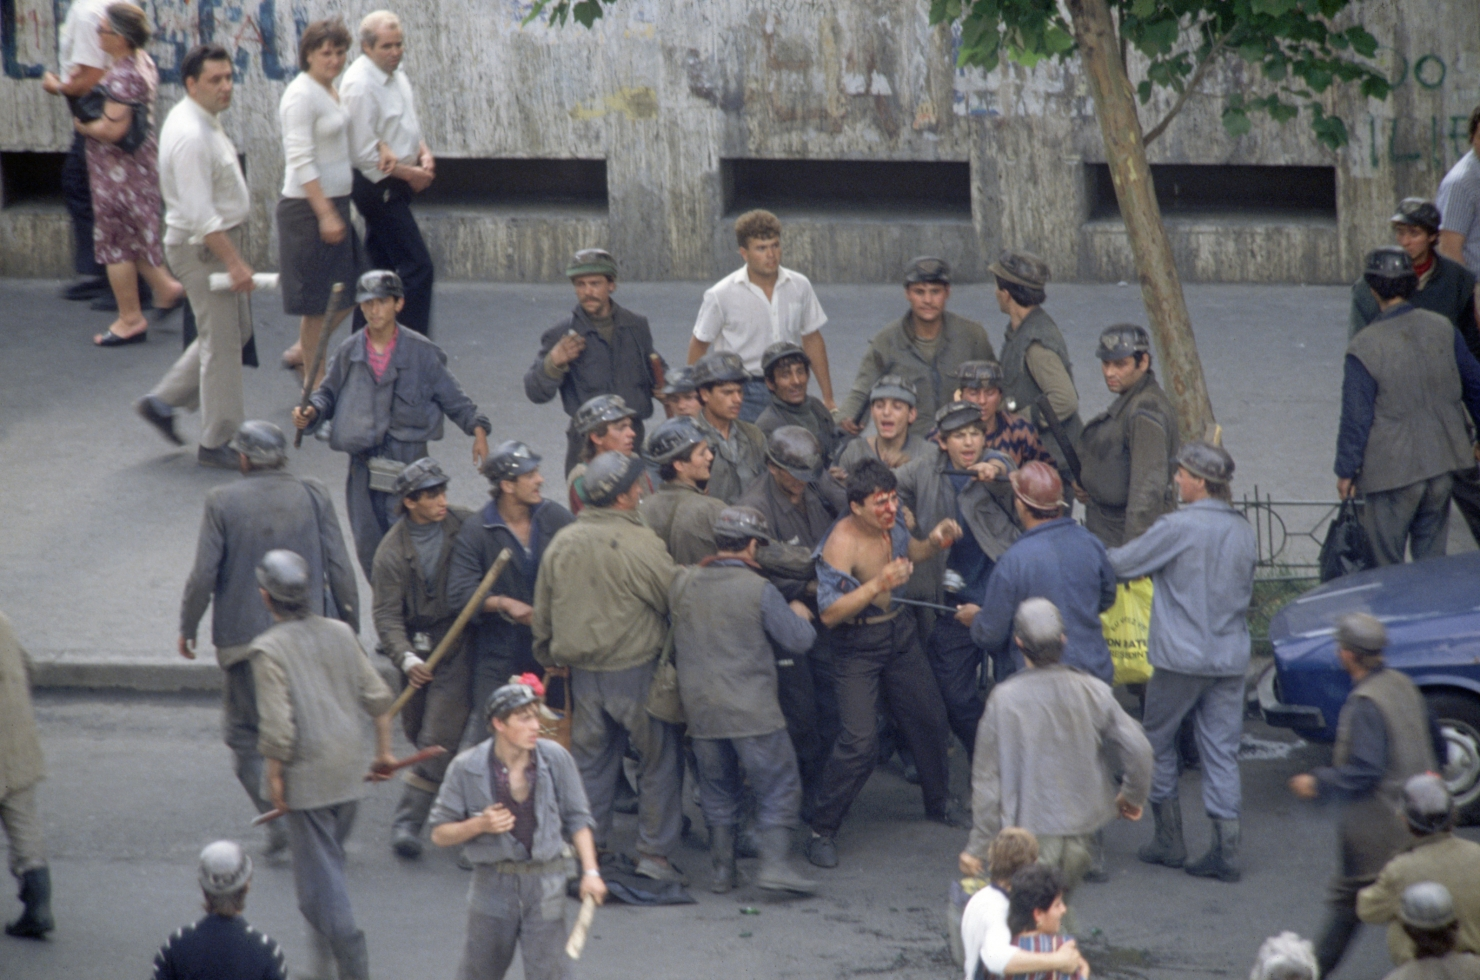 Mineriada 13-15 iunie 1990